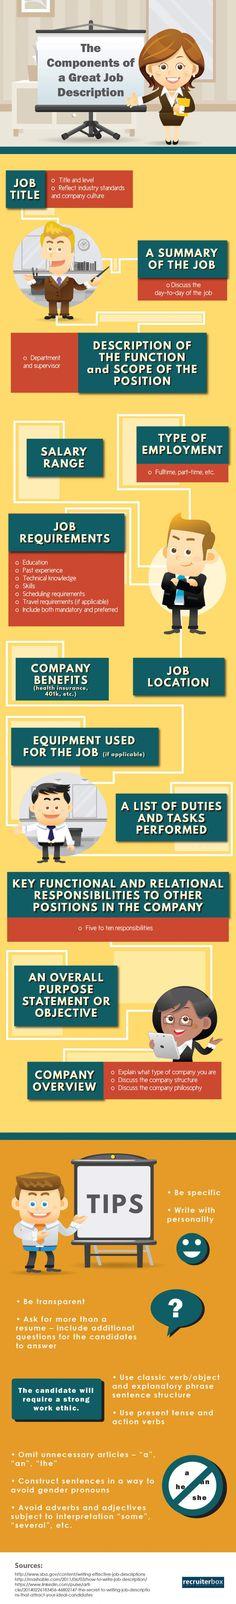 Design Engineer Job - County Tyrone Visual Job Description - engineer job description